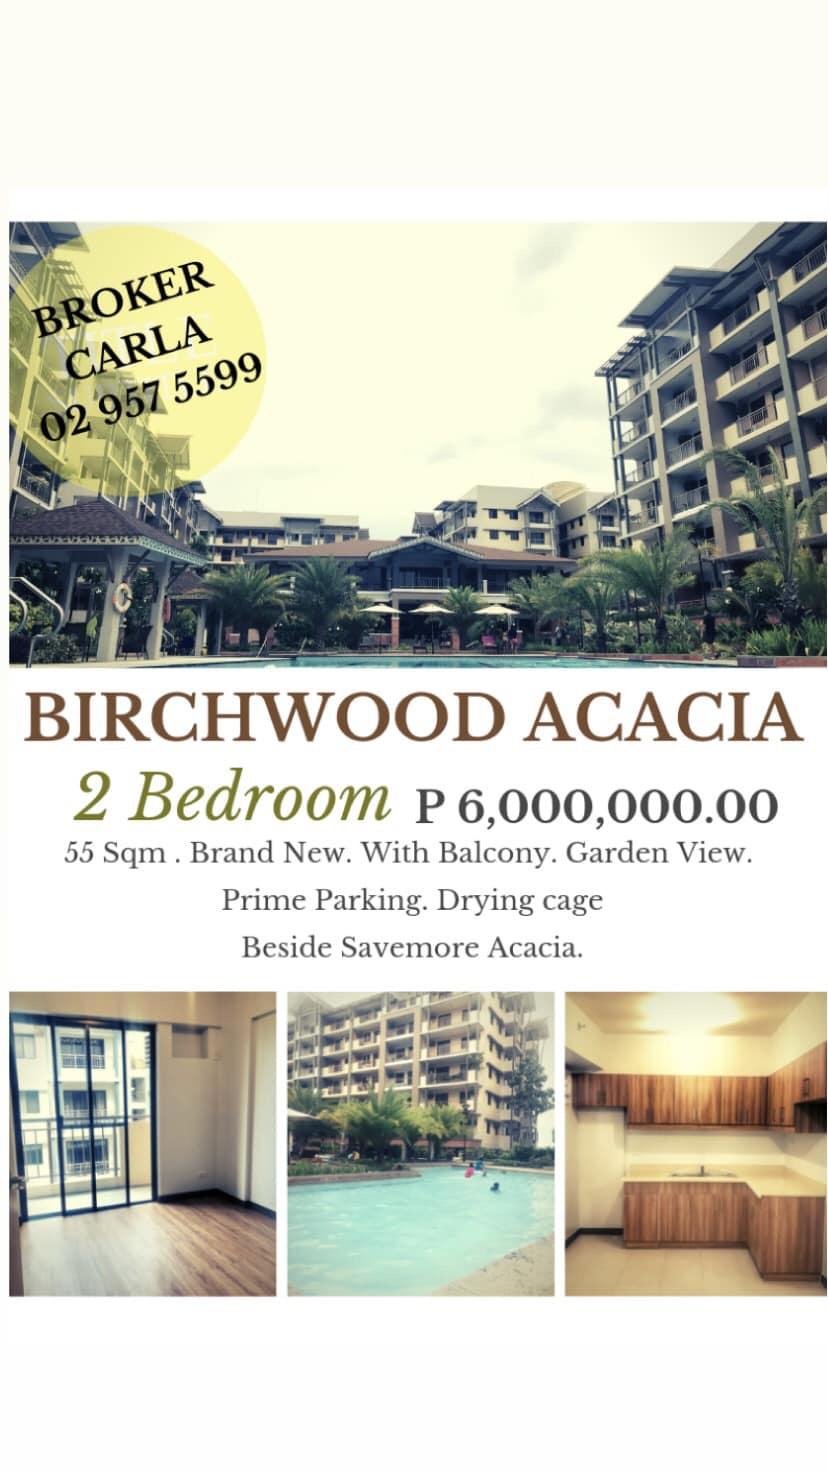 2 Bedroom Birchwood Acacia for Sale